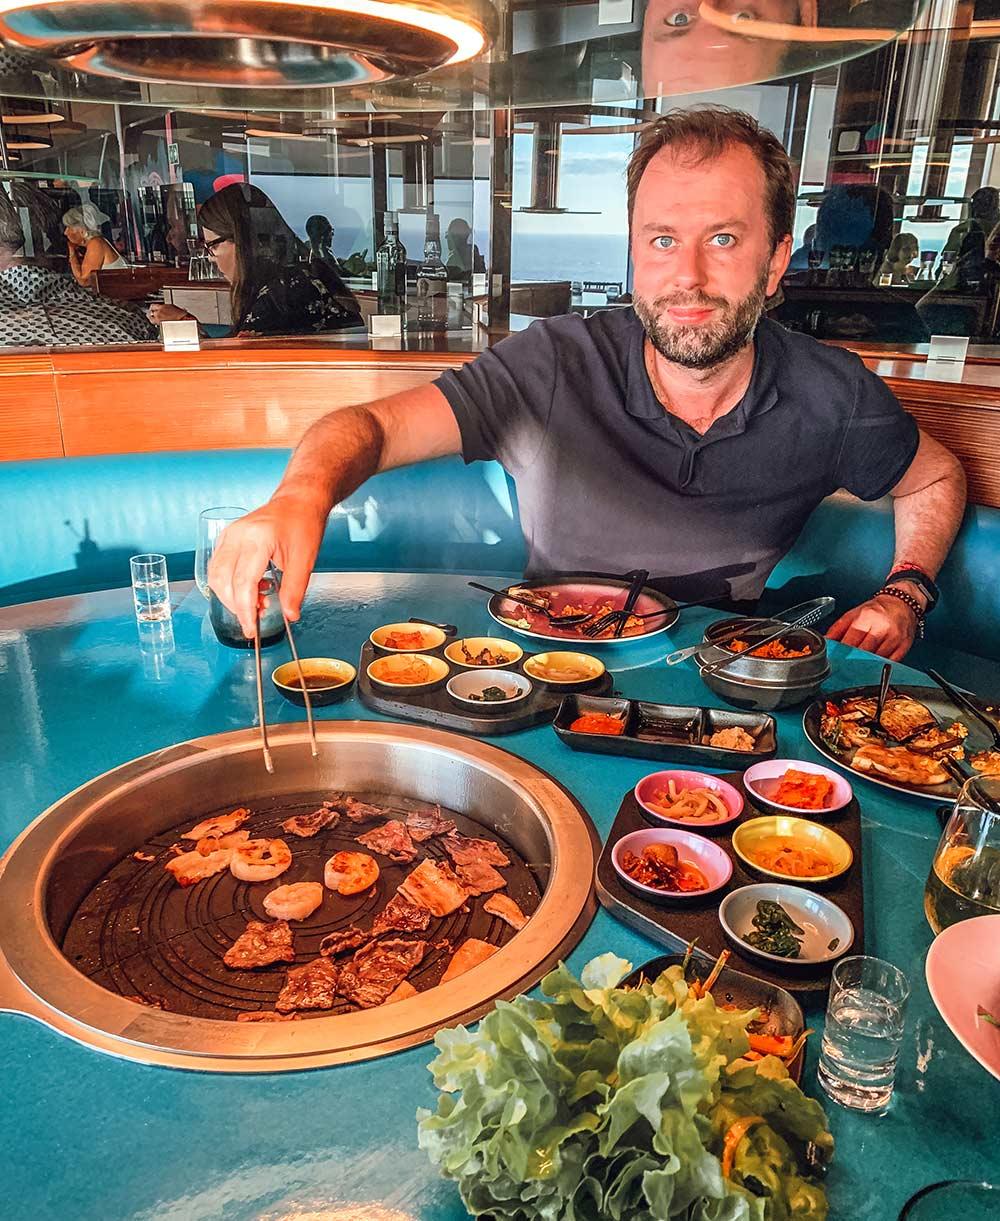 Gunbae South Korean BBQ  restaurant onboard Virgin Voyages Scarlet Lady cruise ship